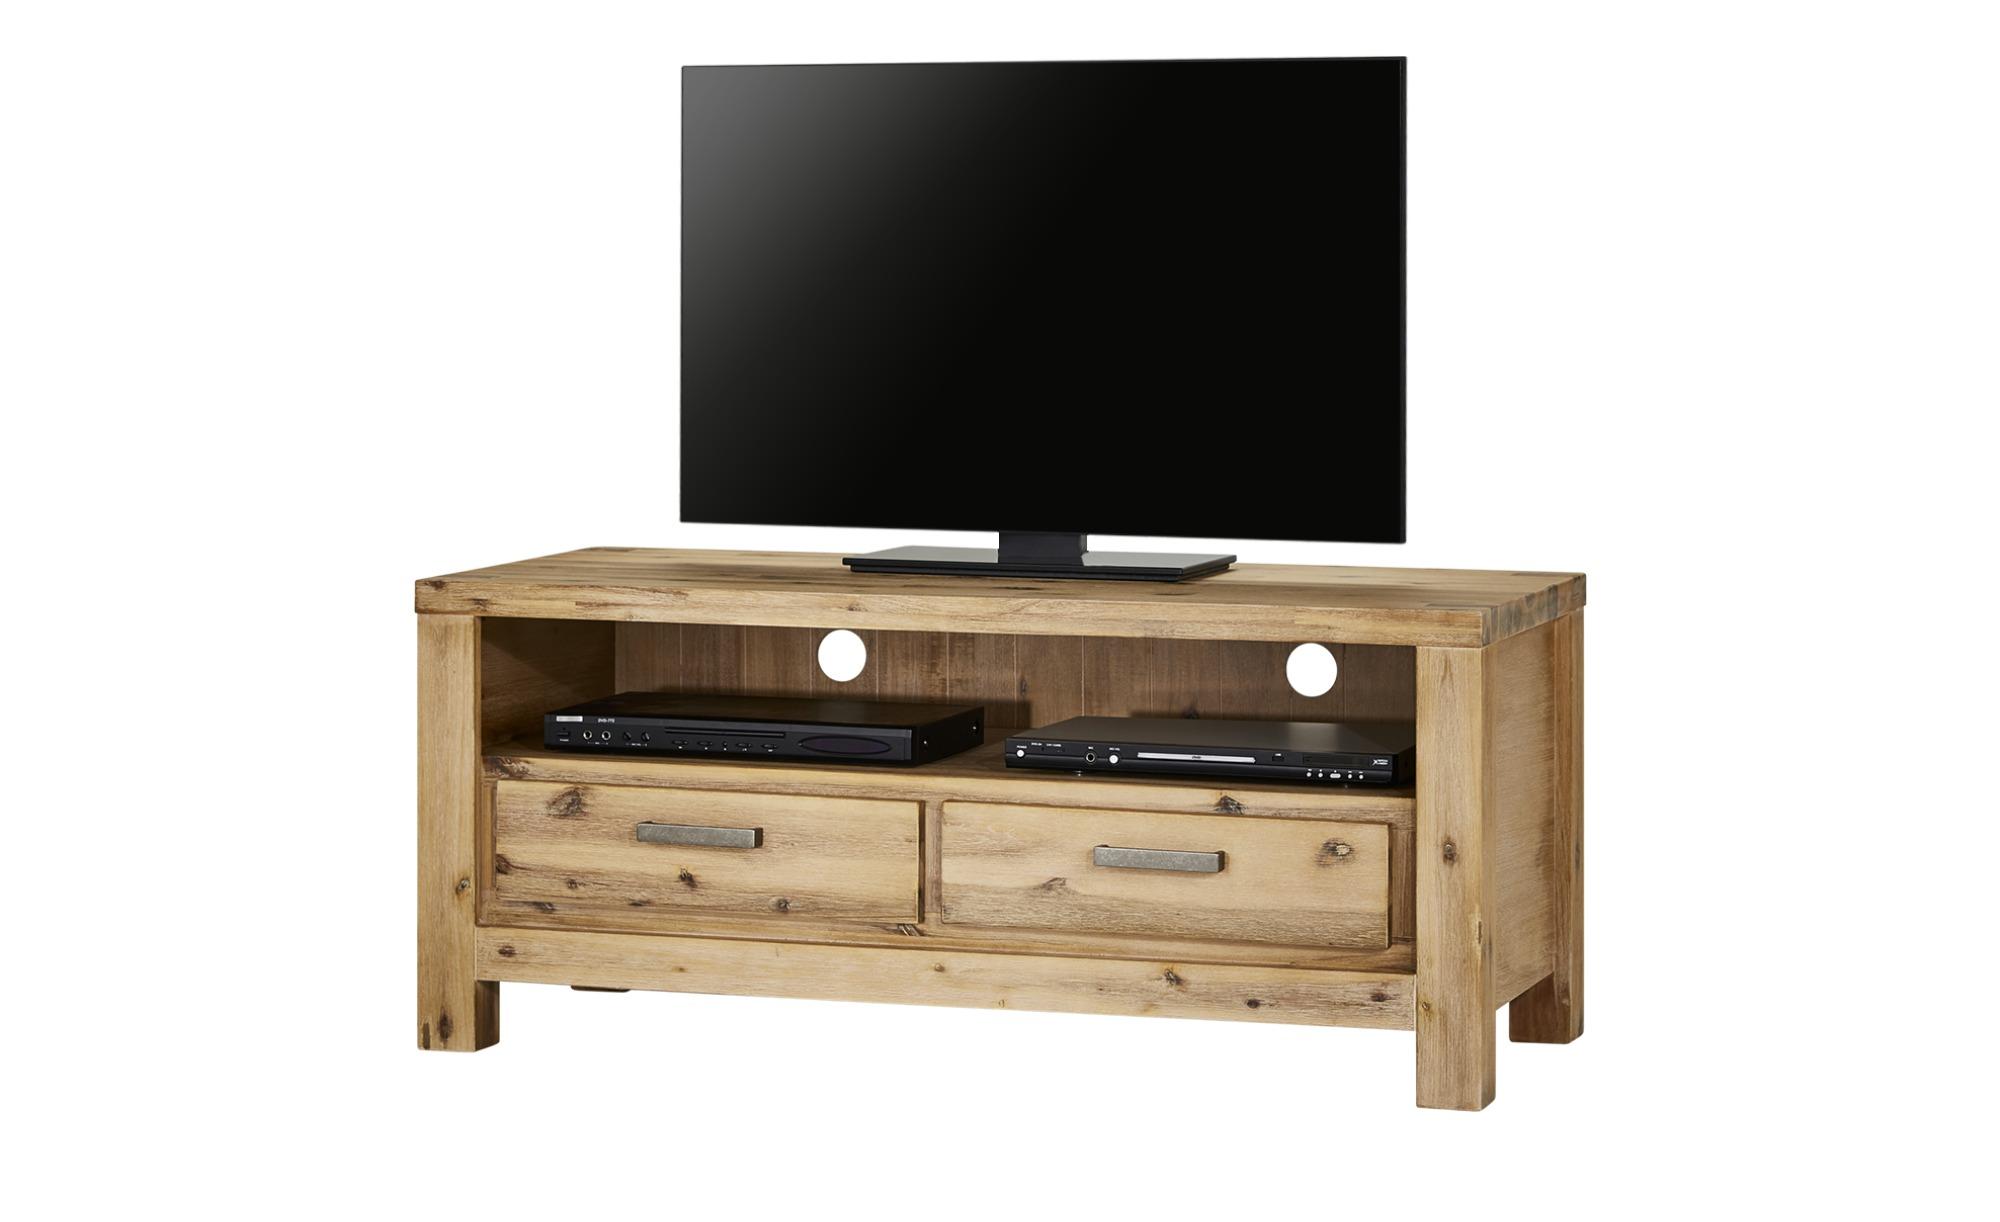 TV-Unterschrank   Borneo ¦ Maße (cm): B: 120 H: 52 T: 51 TV- & Media Möbel > TV-Racks - Höffner